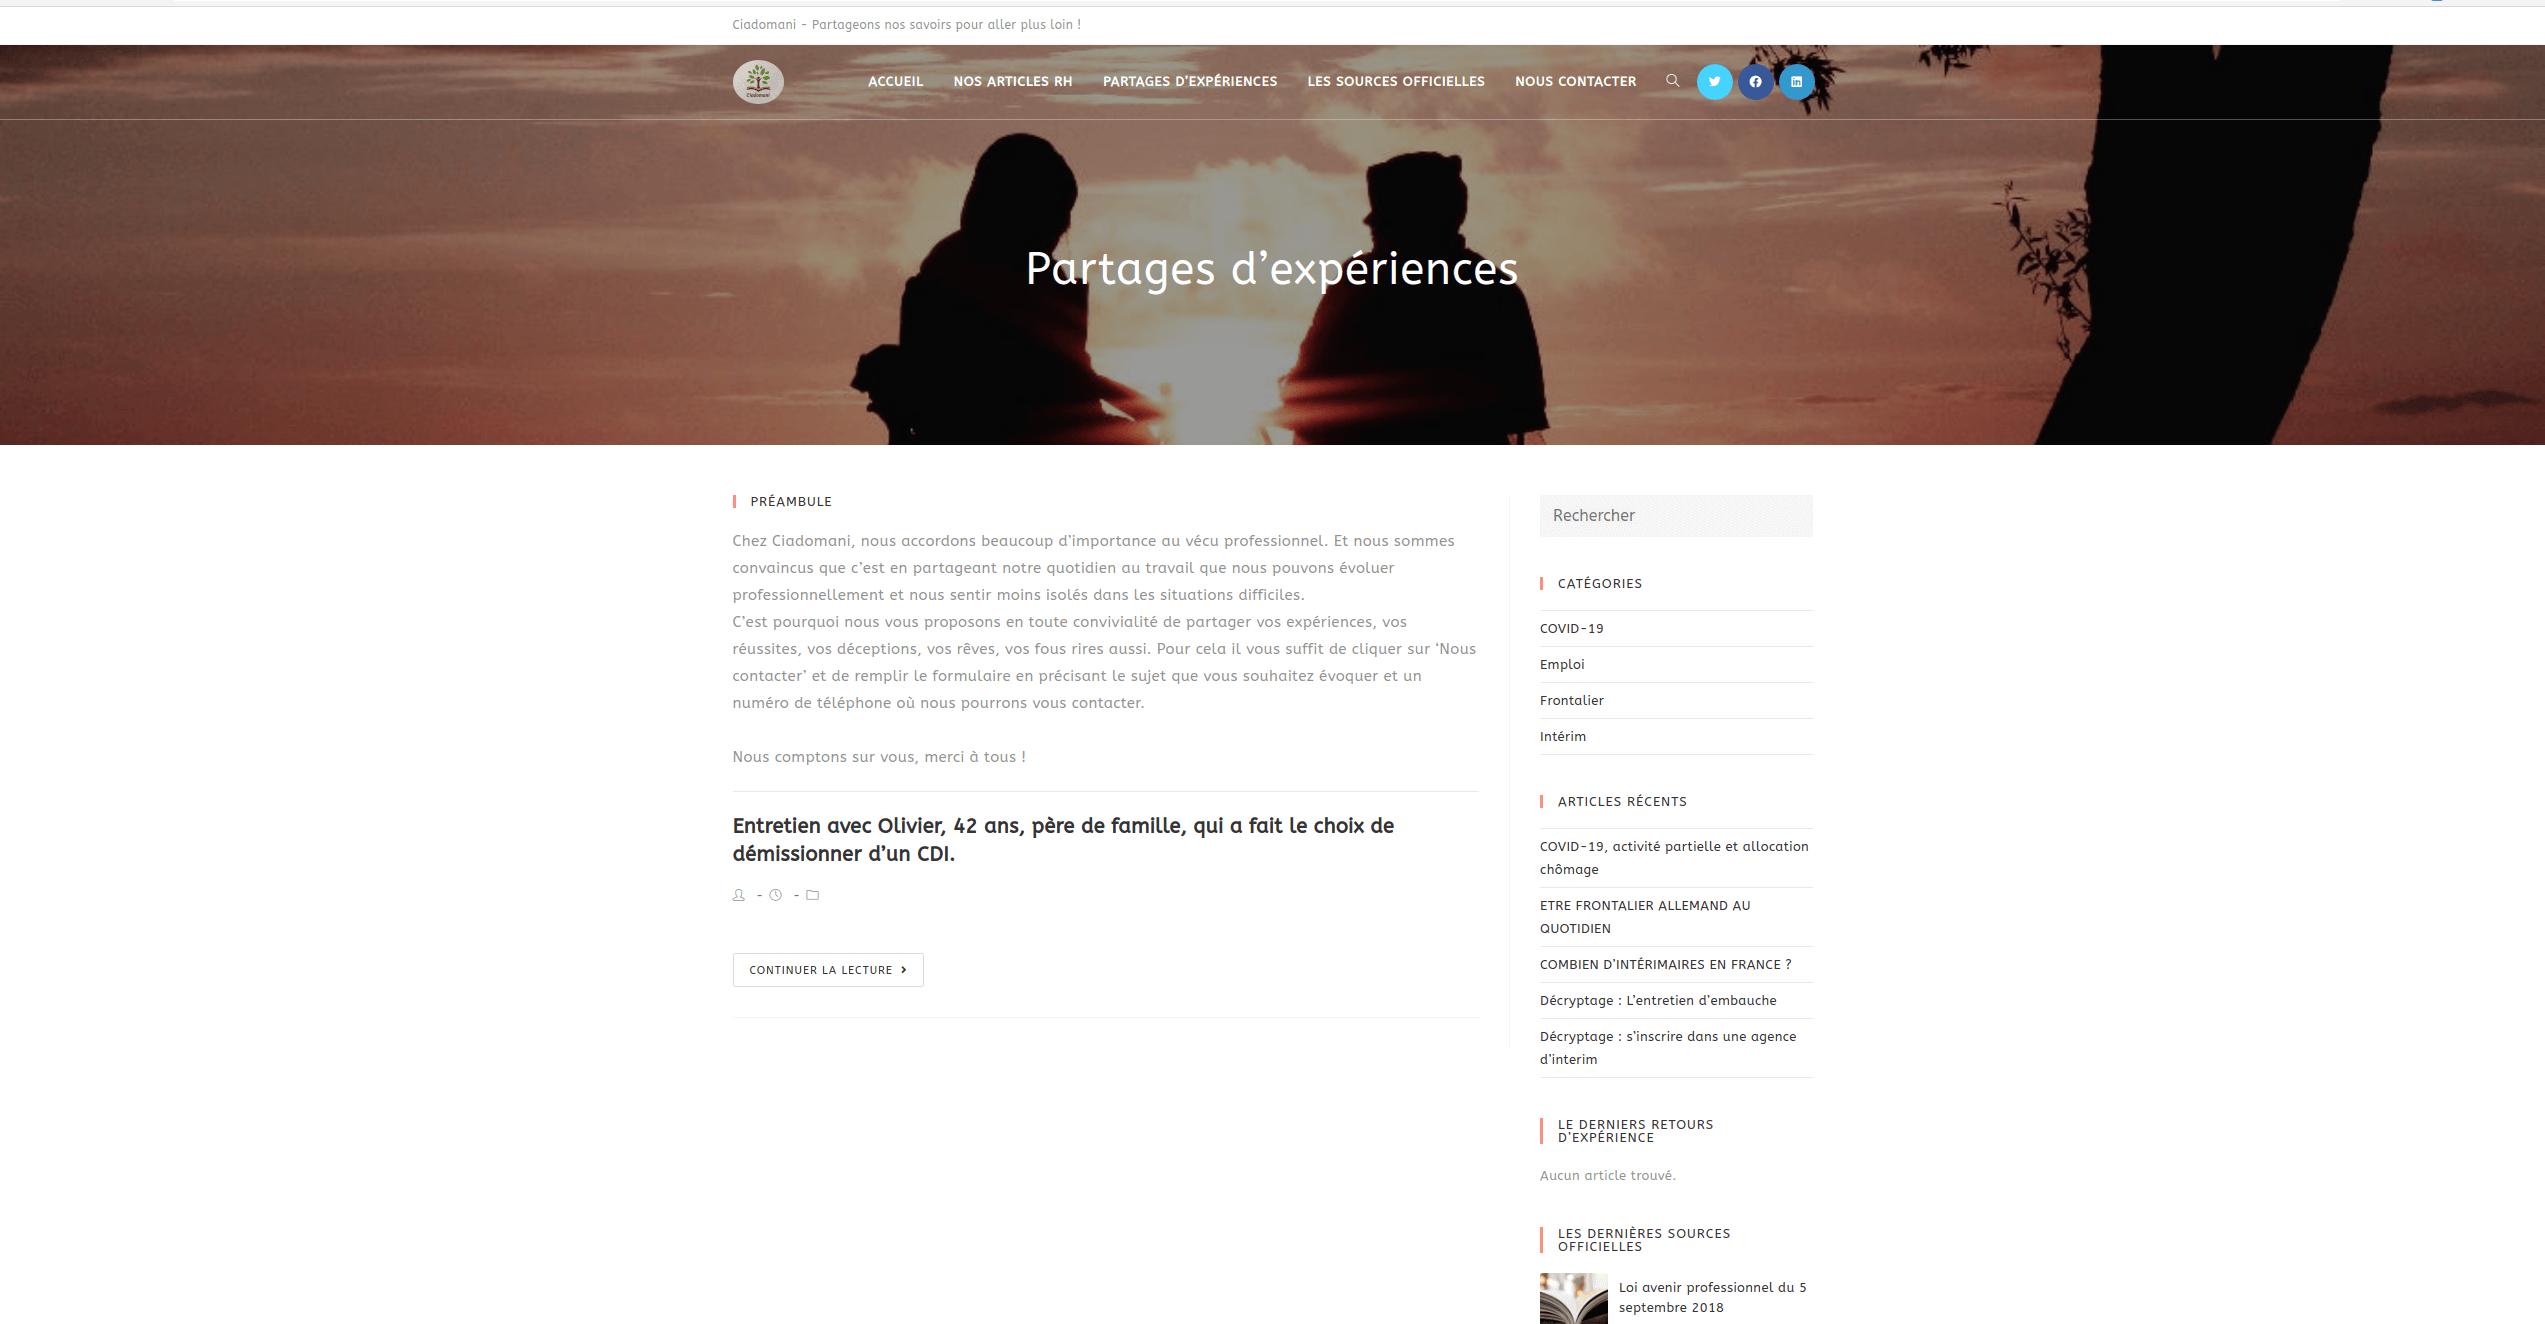 Ciadomani - Espace de partages experiences